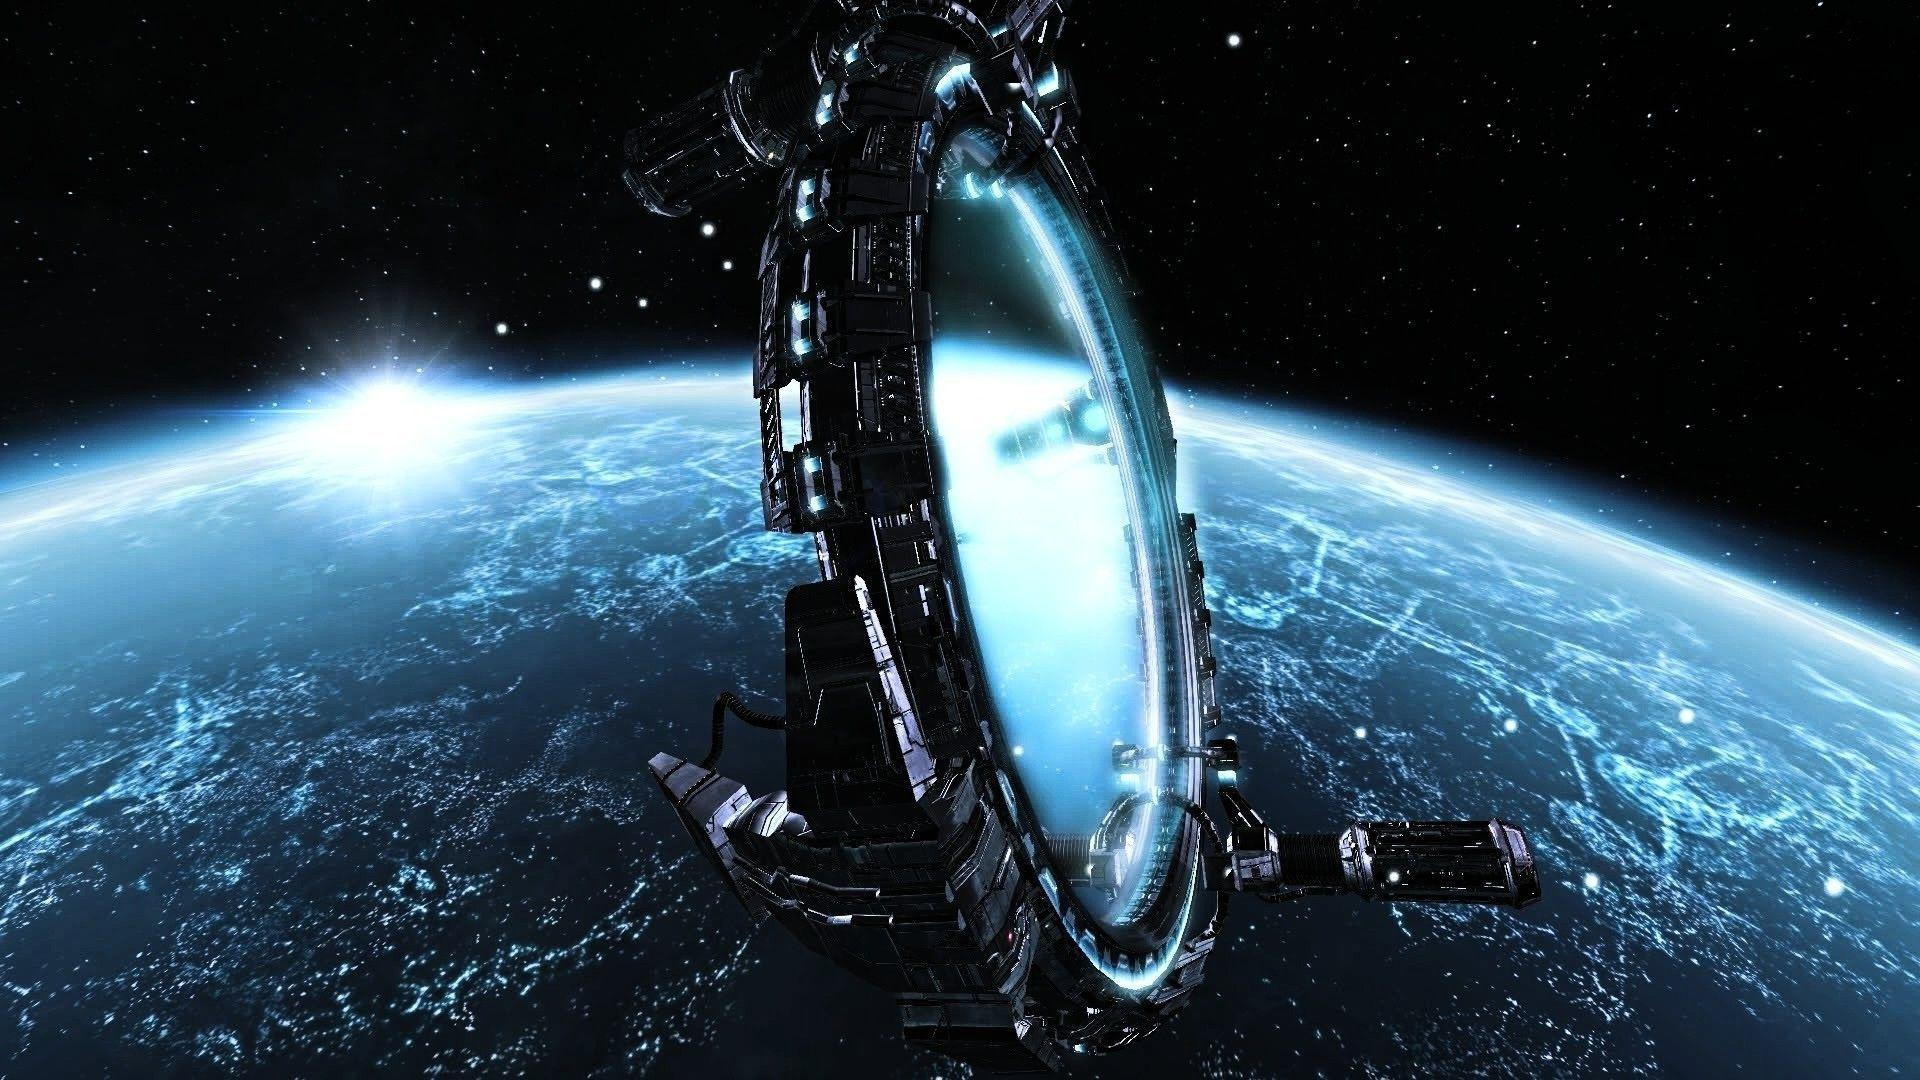 stargate wallpaper universe space - photo #21